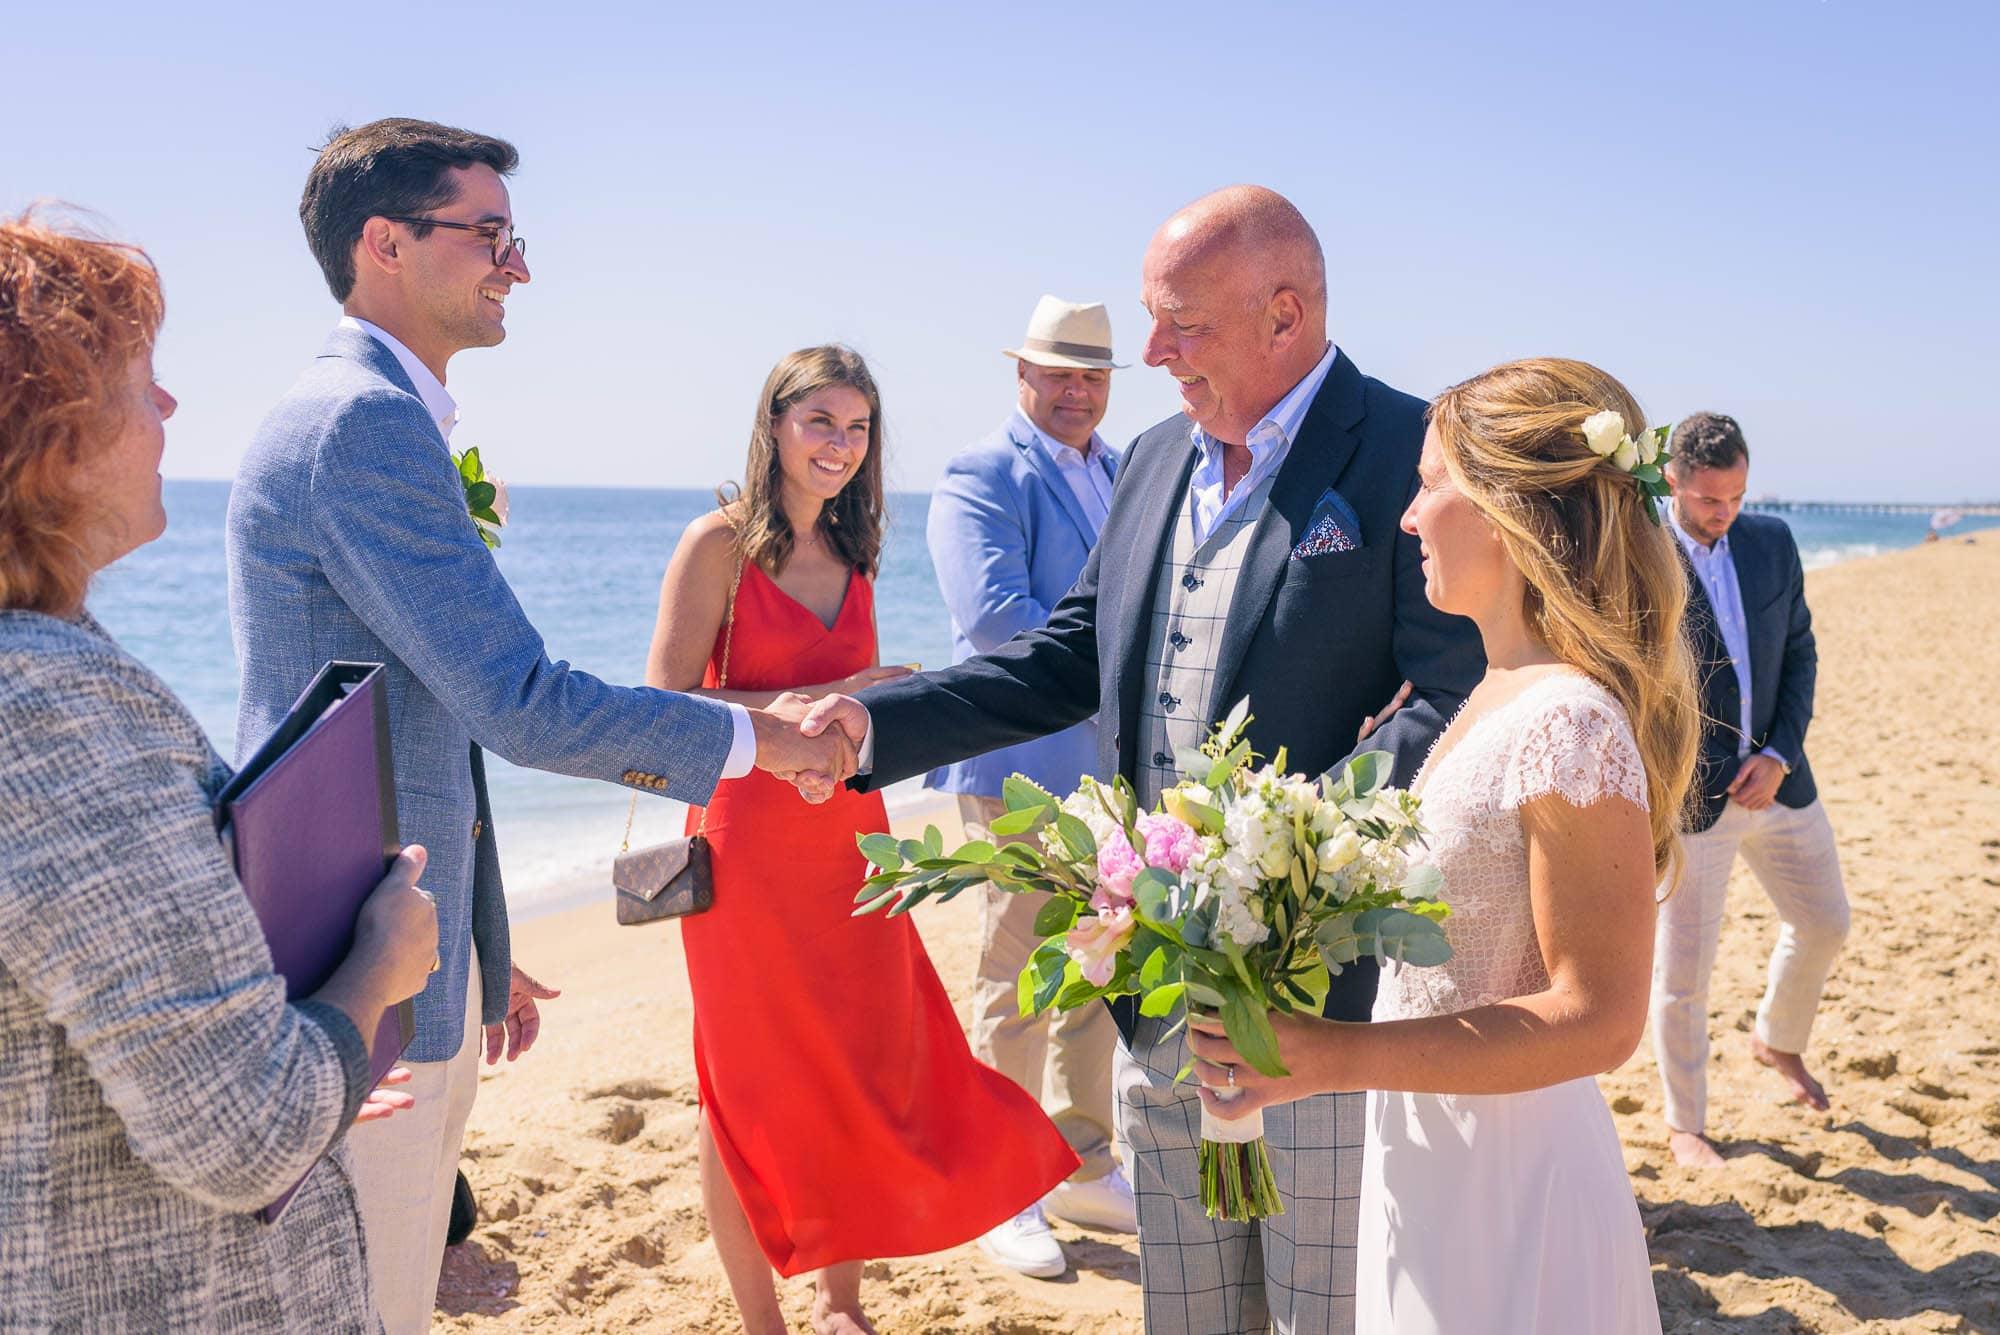 019_Alan_and_Heidi_Wedding_Verena_Andreas